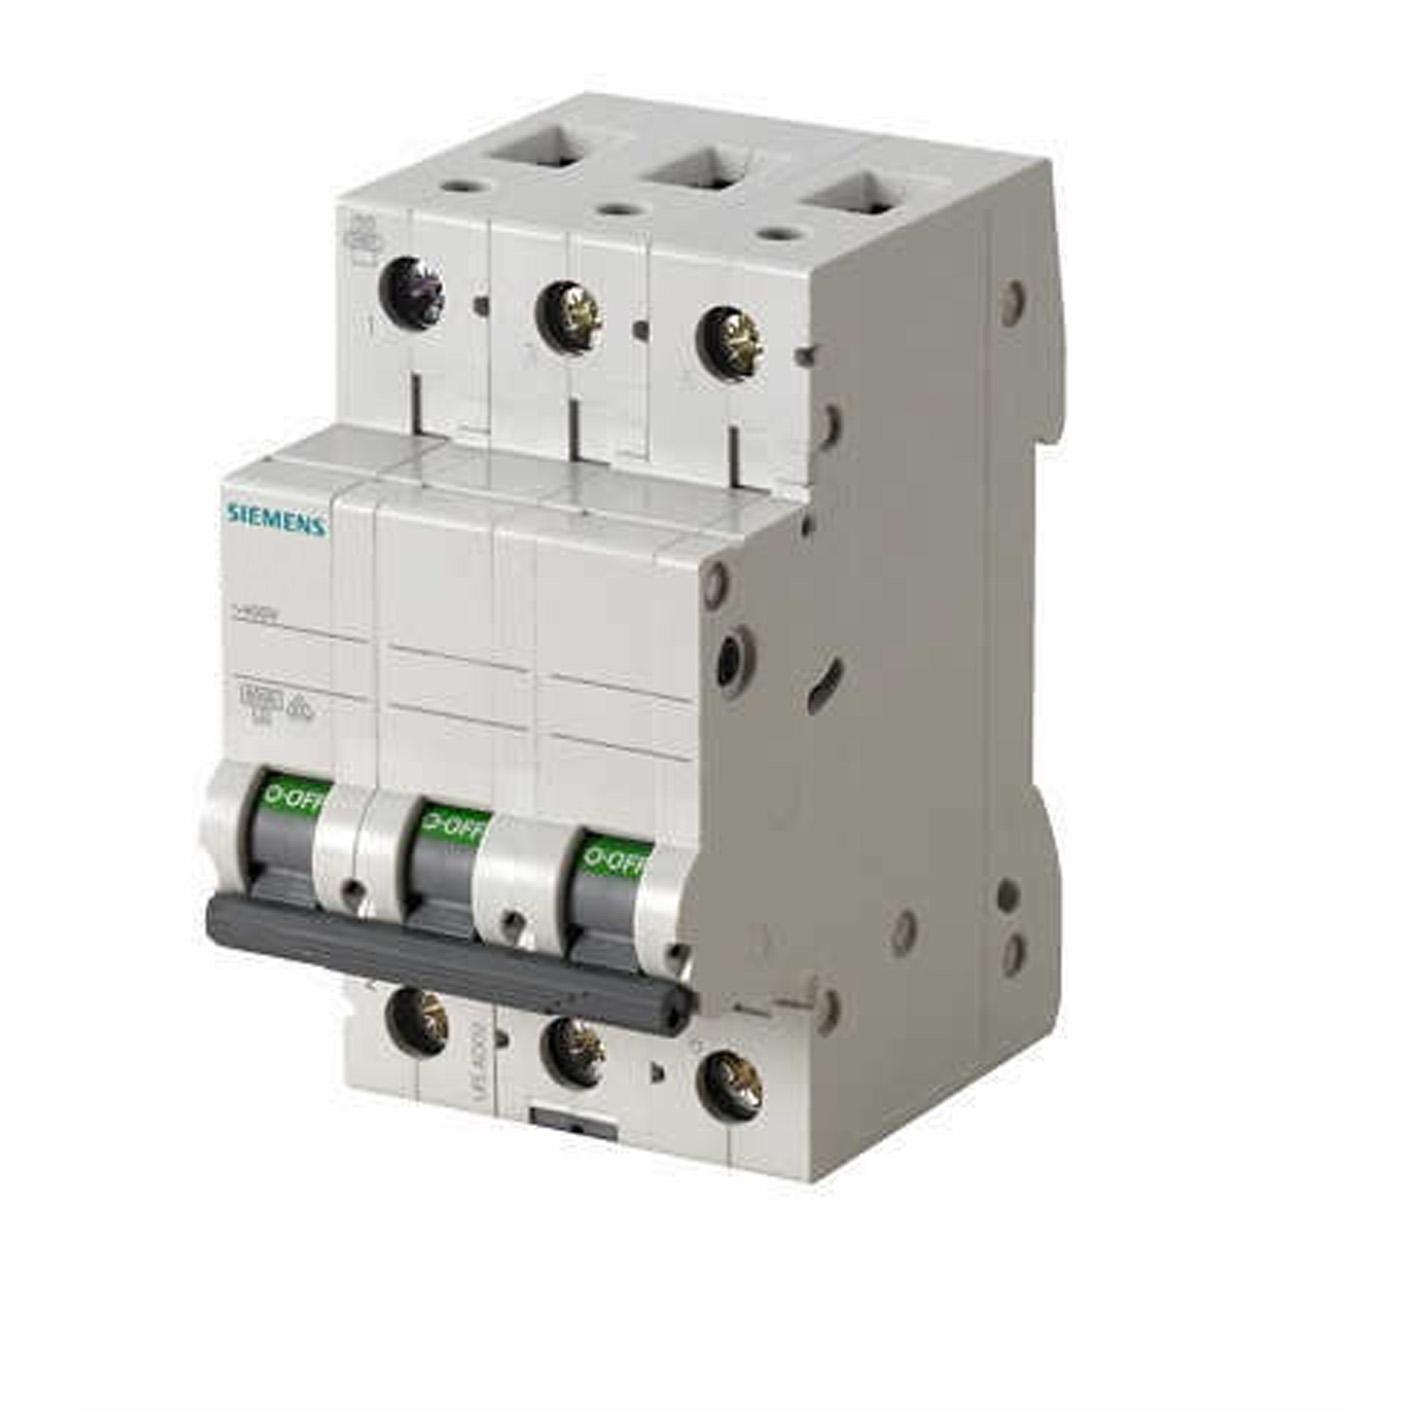 Siemens 3X50A Otomatik Sigorta